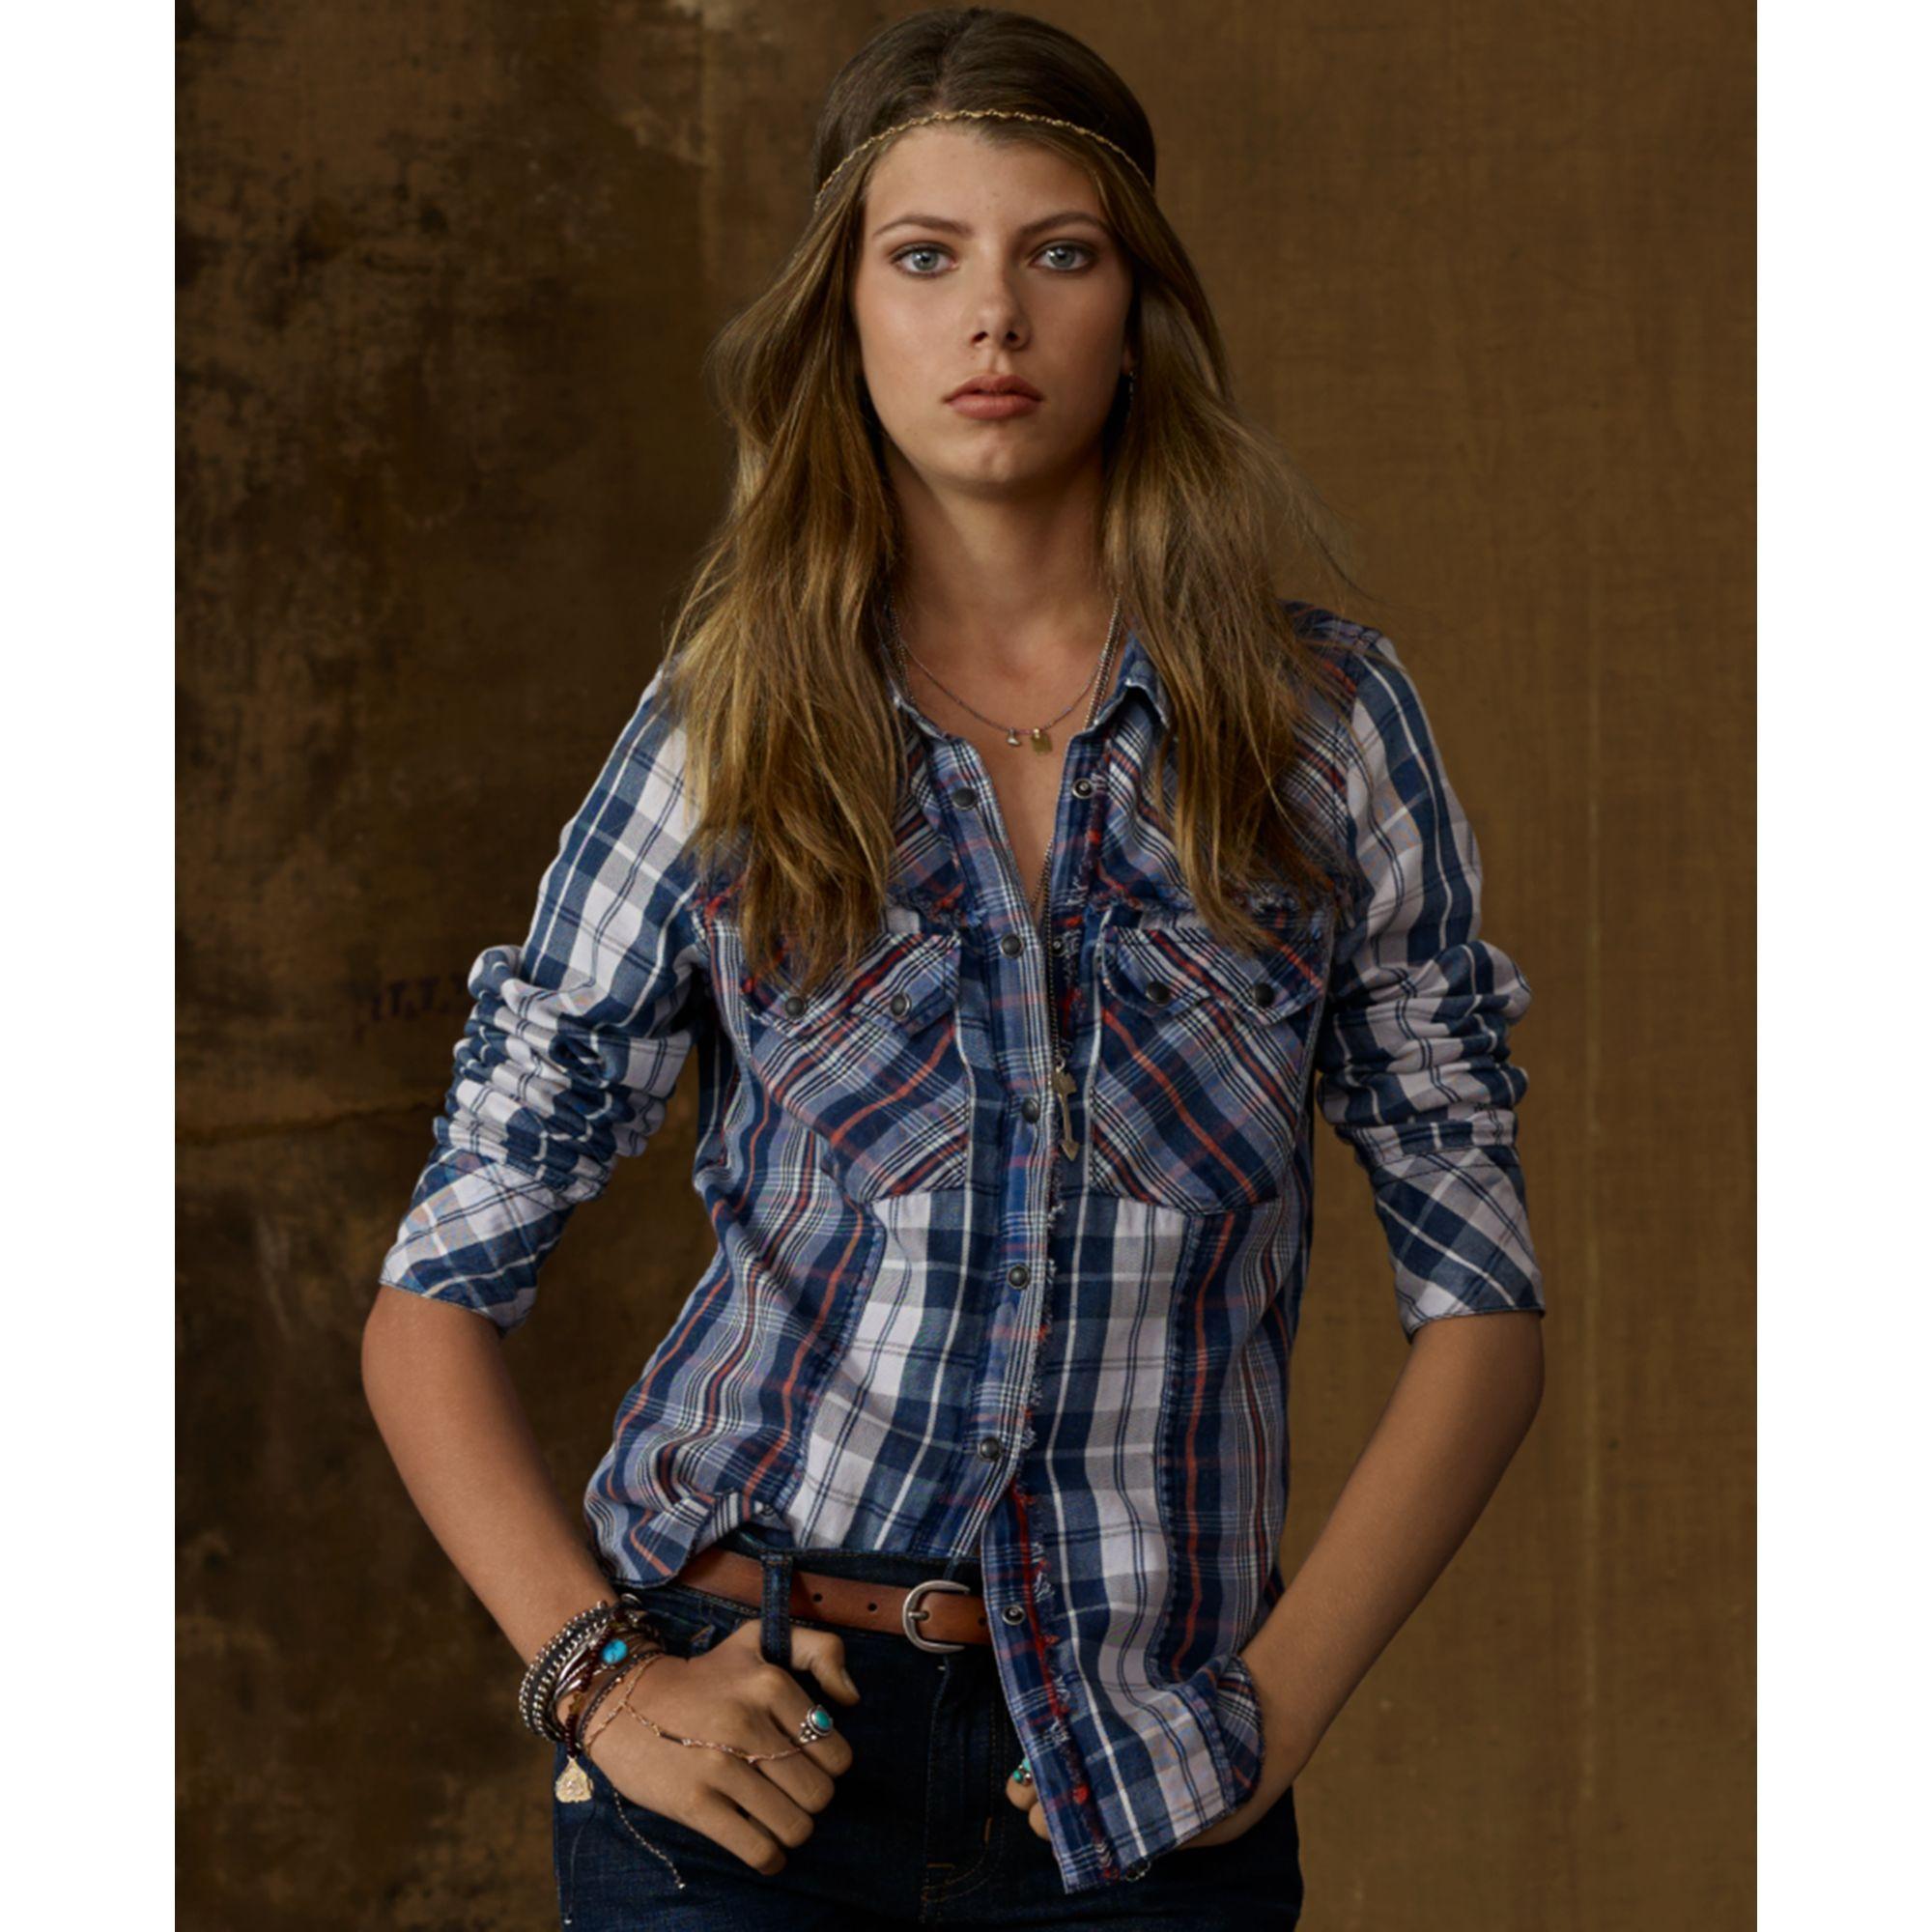 Ralph lauren clothes for women